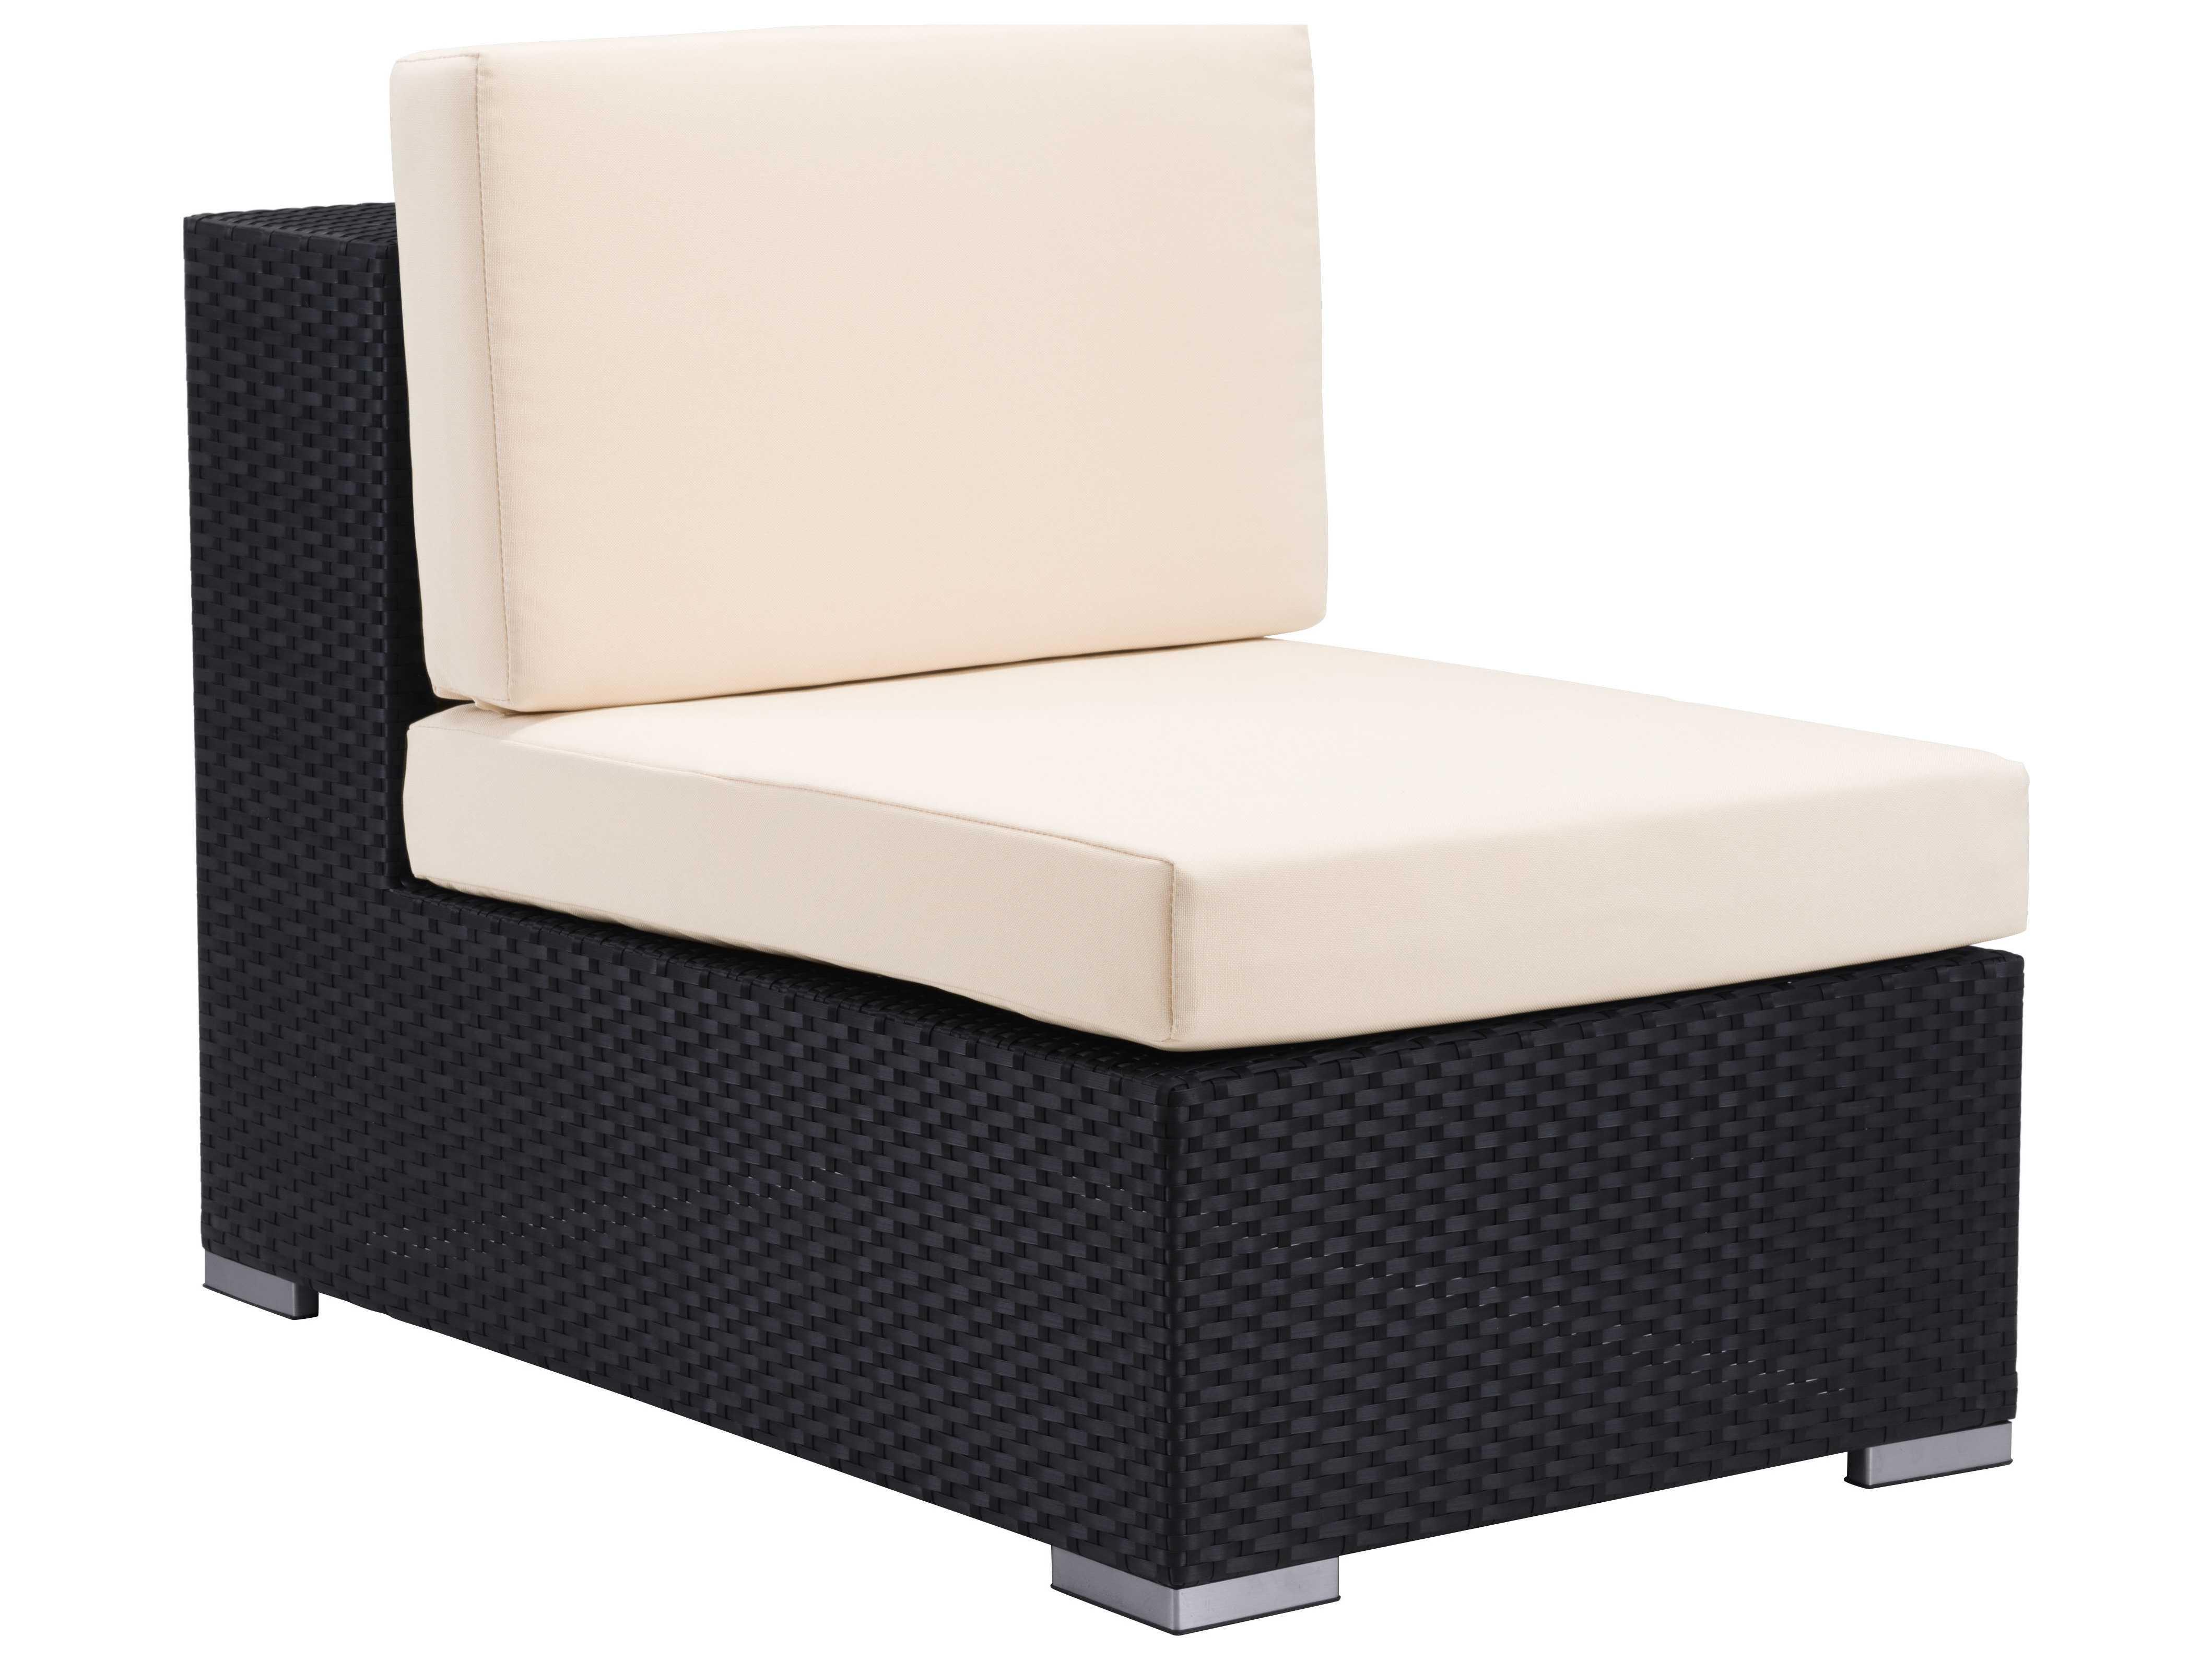 Zuo Outdoor Cartagena Aluminum Wicker Middle Chair in Espresso